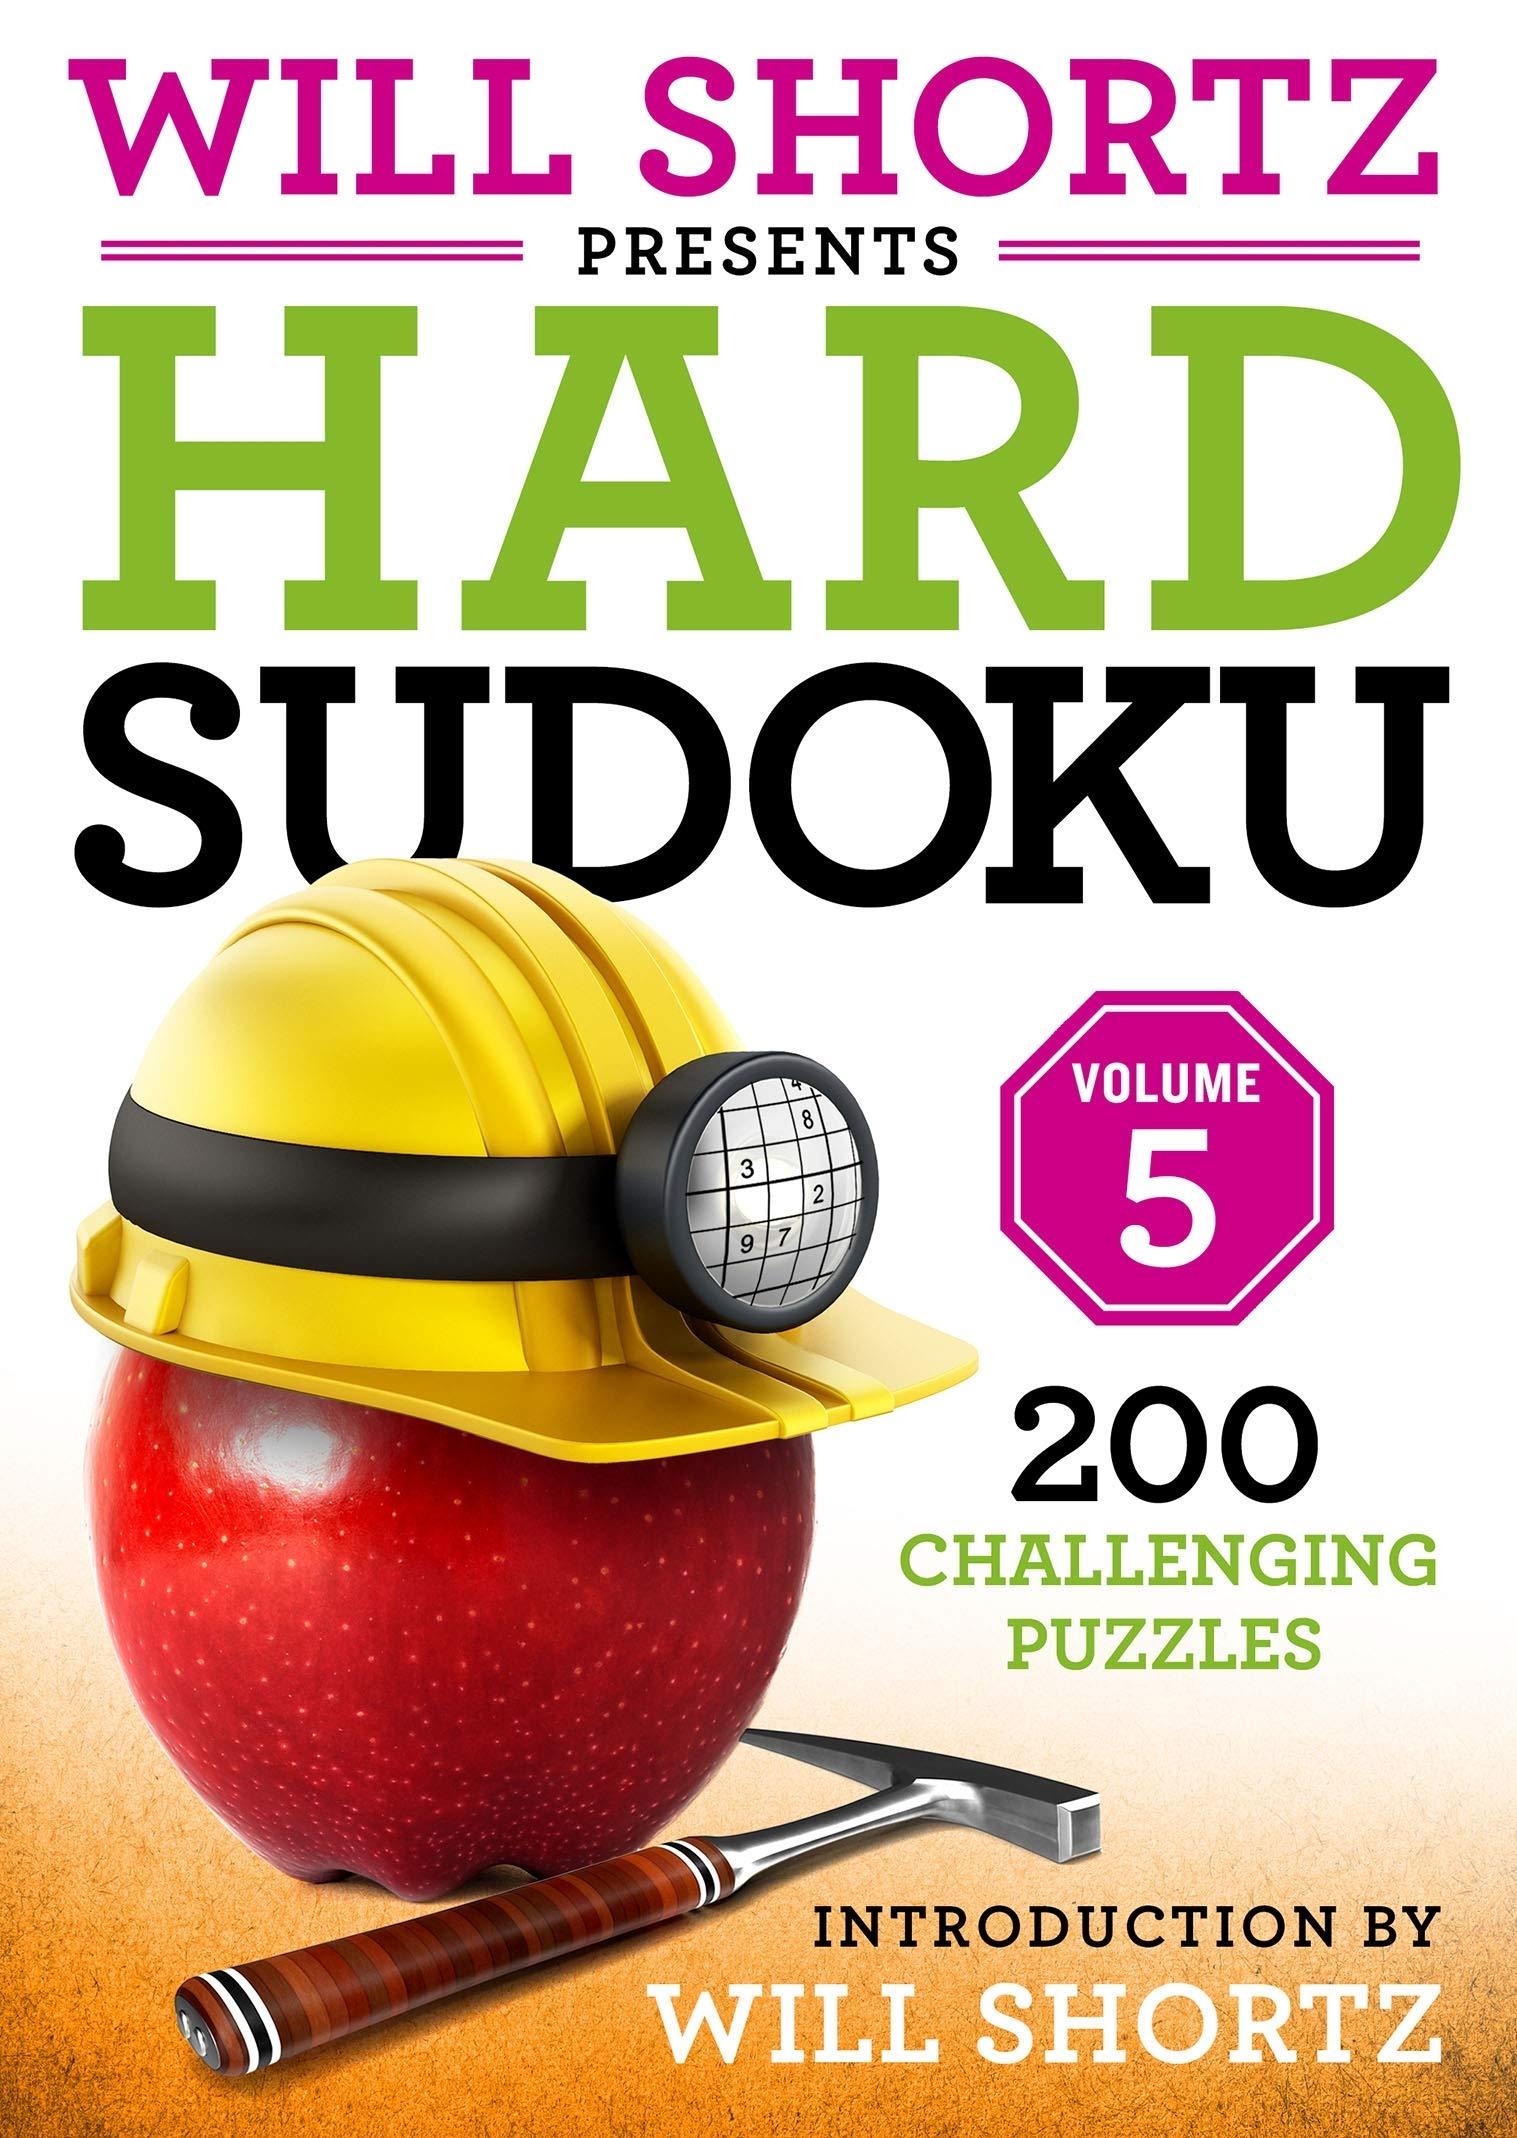 Will Shortz Presents Hard Sudoku Volume 5  200 Challenging Puzzles